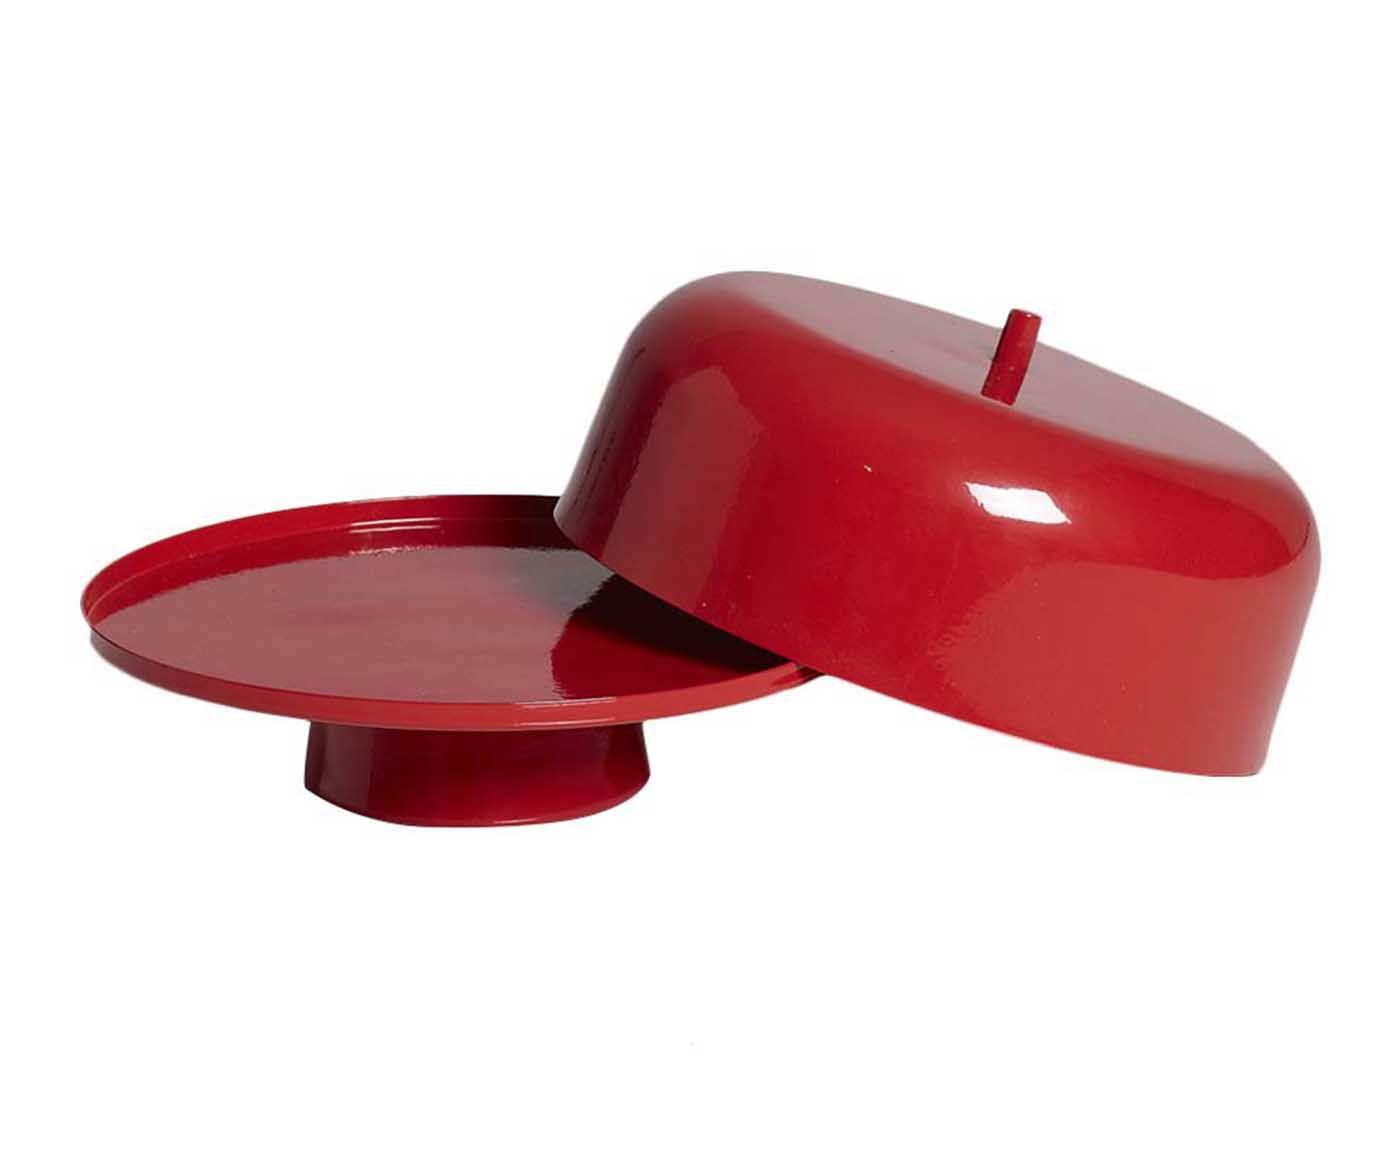 Queijeira modern charm - rama | Westwing.com.br